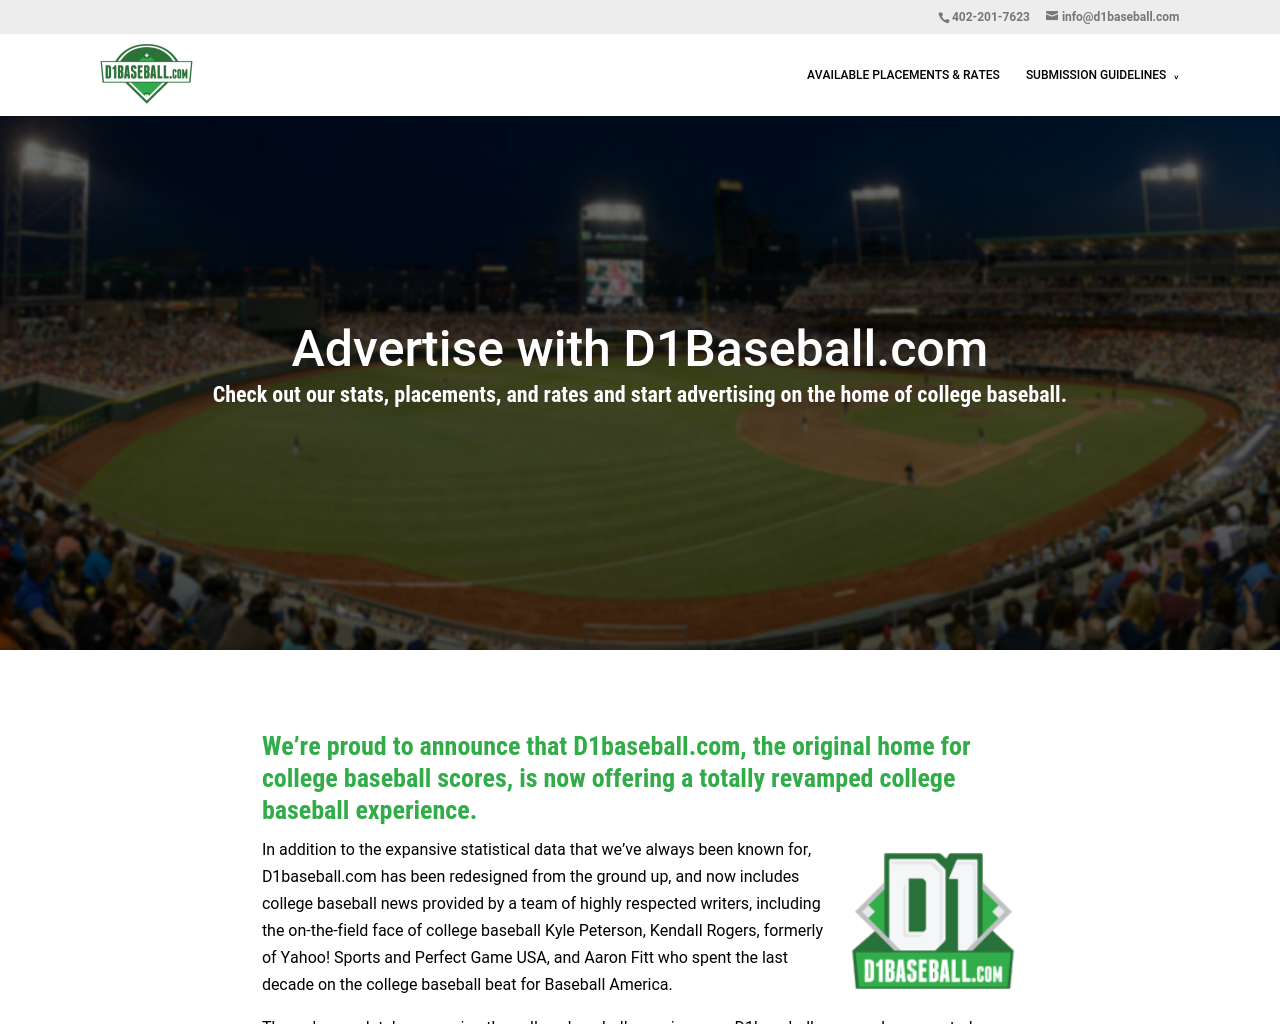 D1Baseball.com-Advertising-Reviews-Pricing